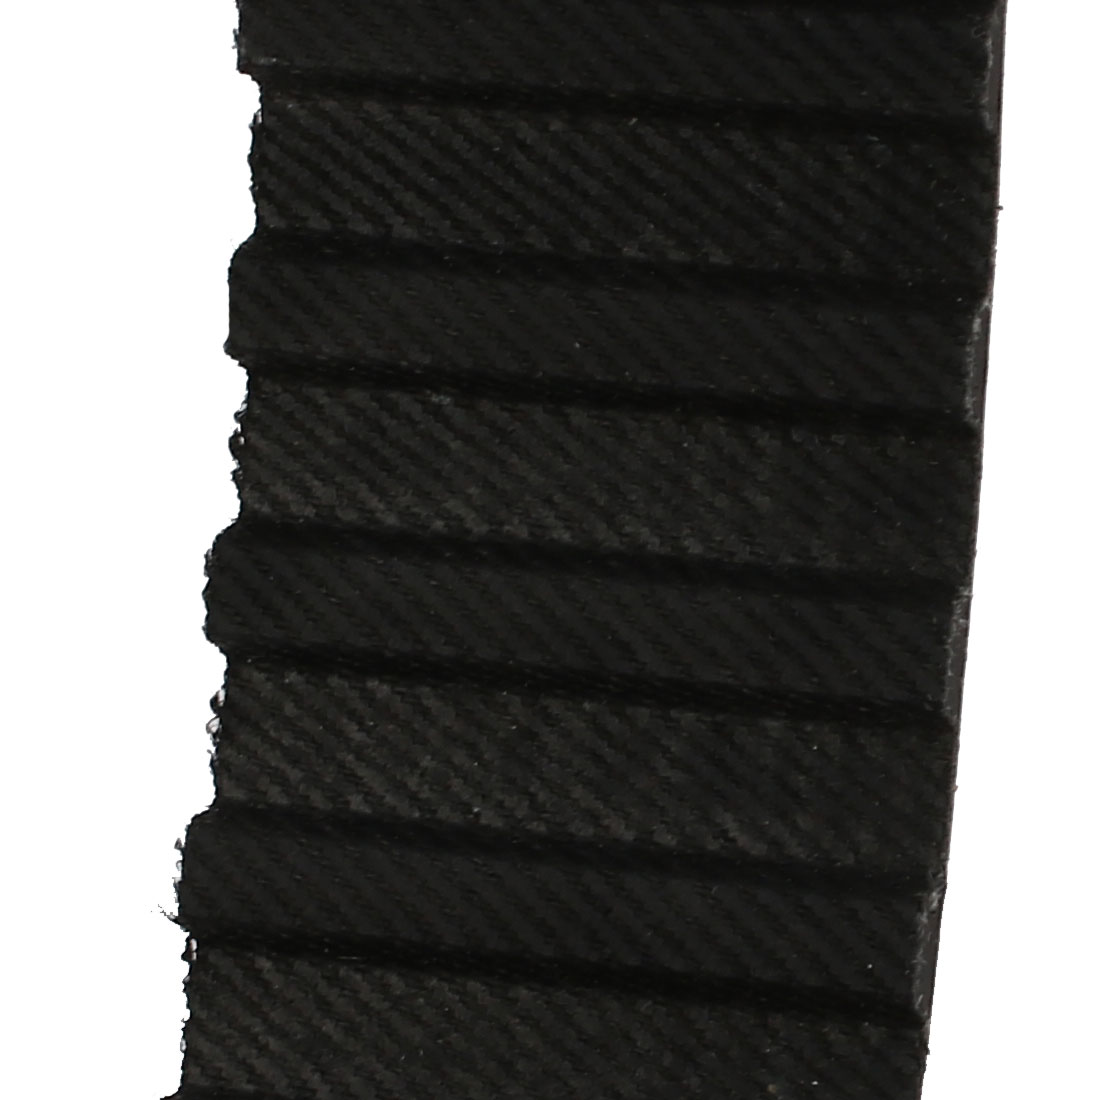 Unique Bargains 259L 69 Teeth 20mm Width 9.525mm Pitch Stepper Motor Rubber Timing Belt Black - image 1 de 3